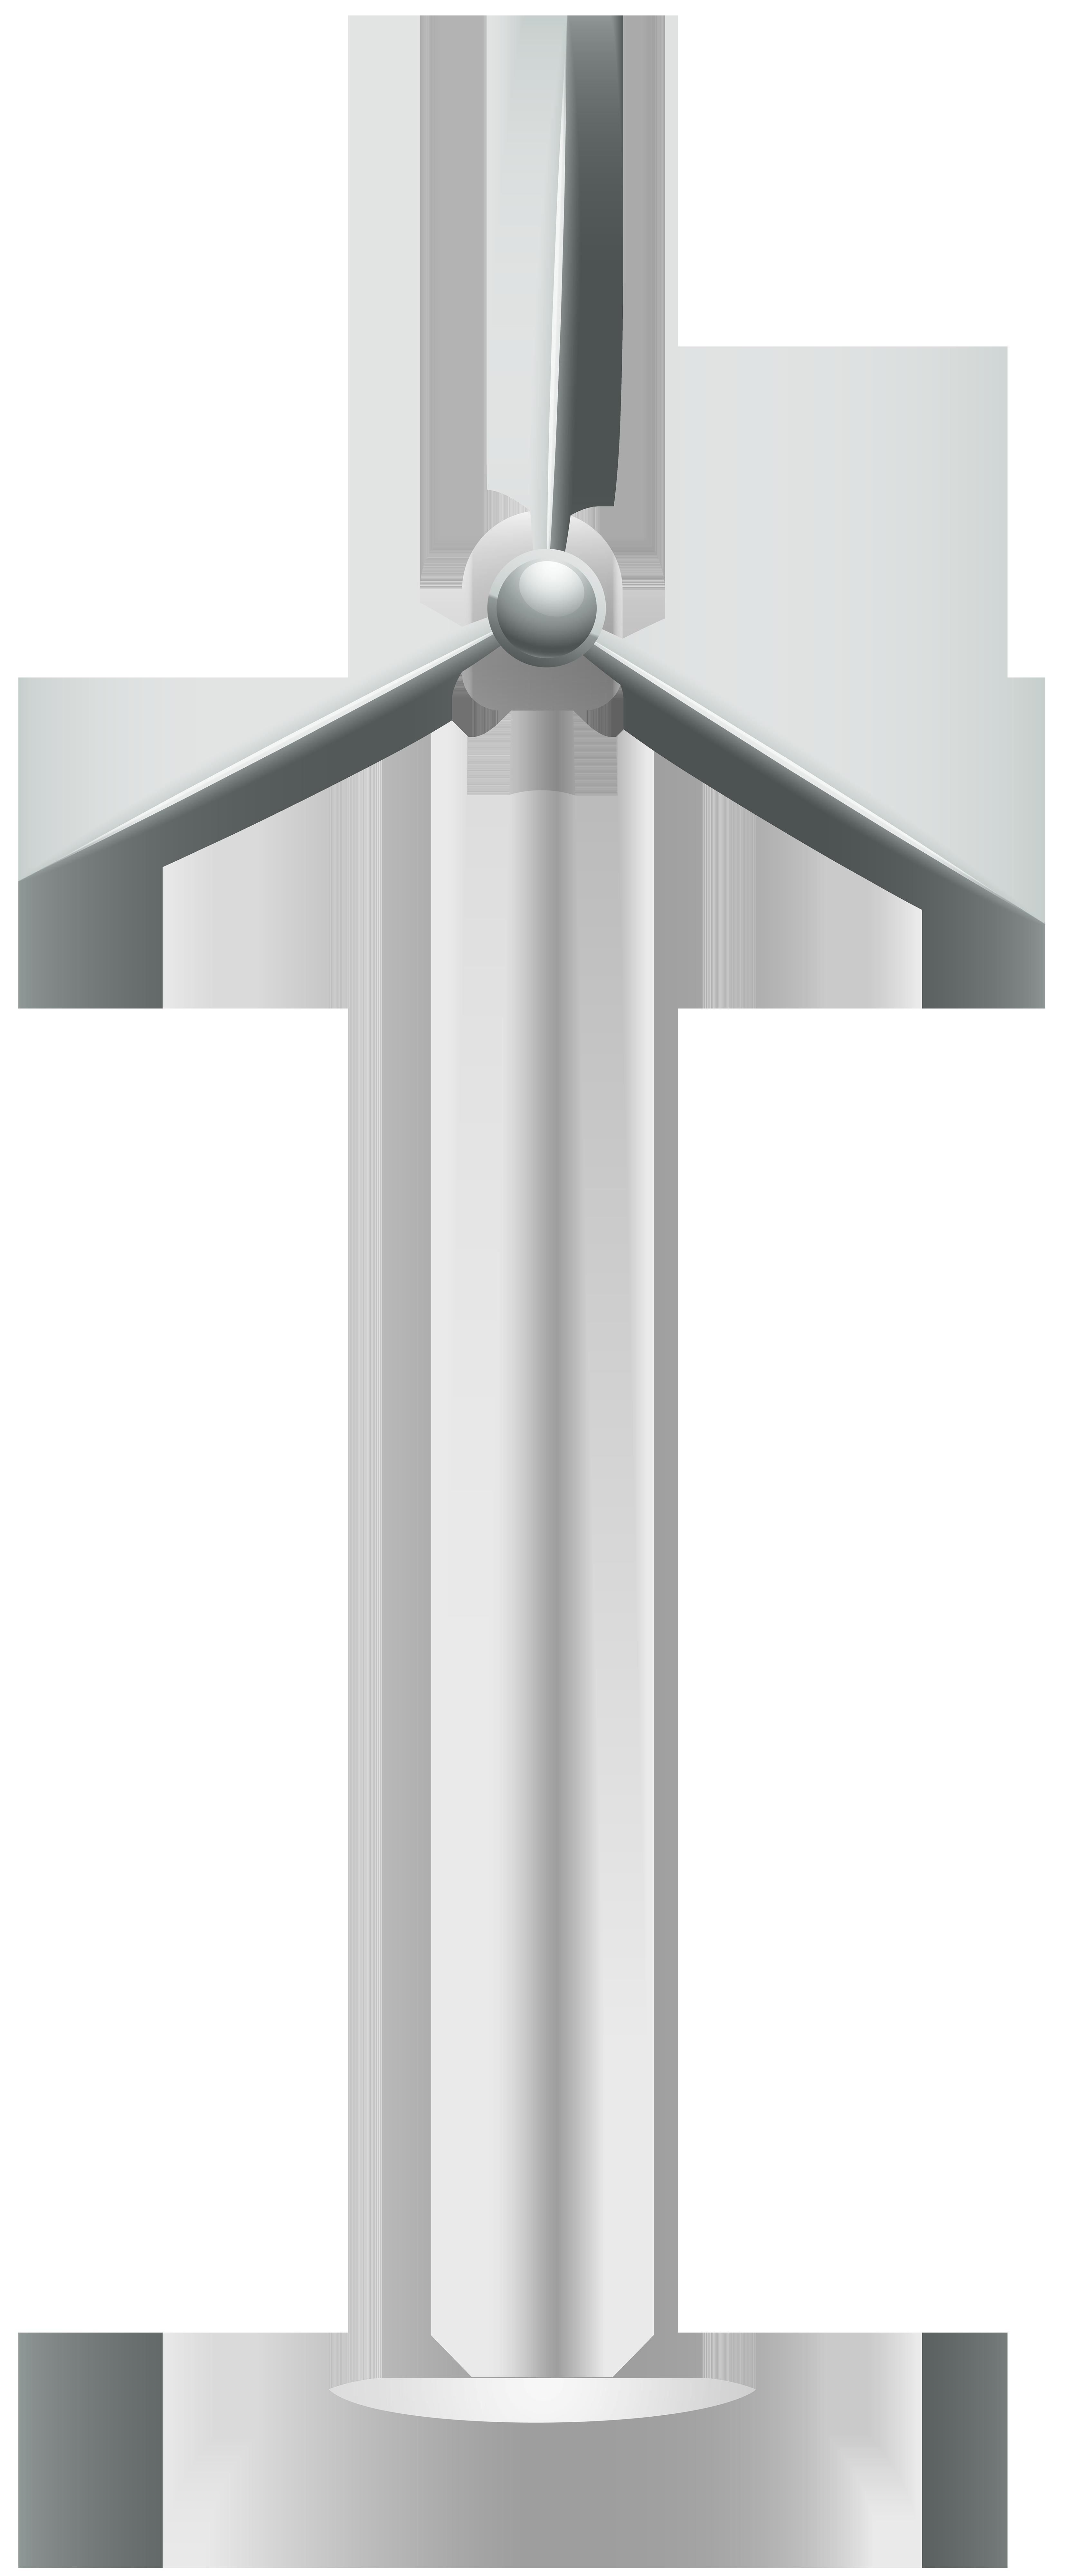 Wind turbine clip art at vector clip art.